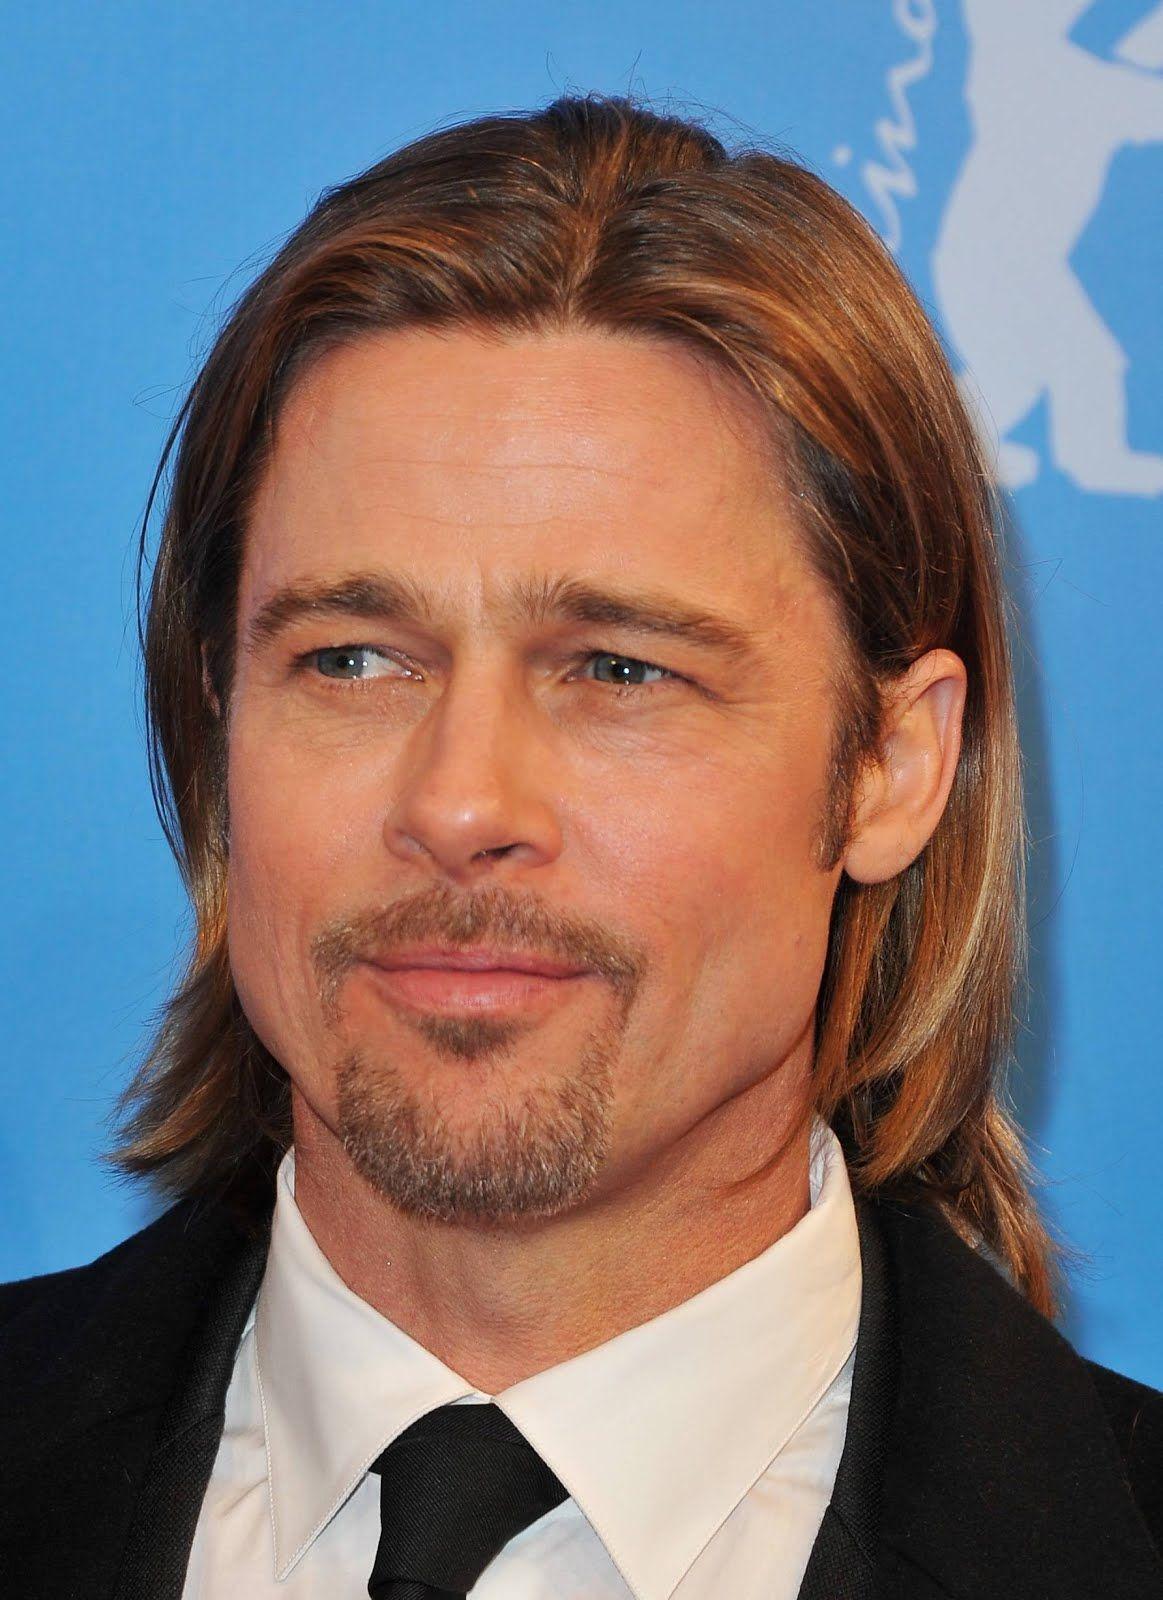 Men haircut long face brad pitt  bradpitt  celebridades  pinterest  brad pitt